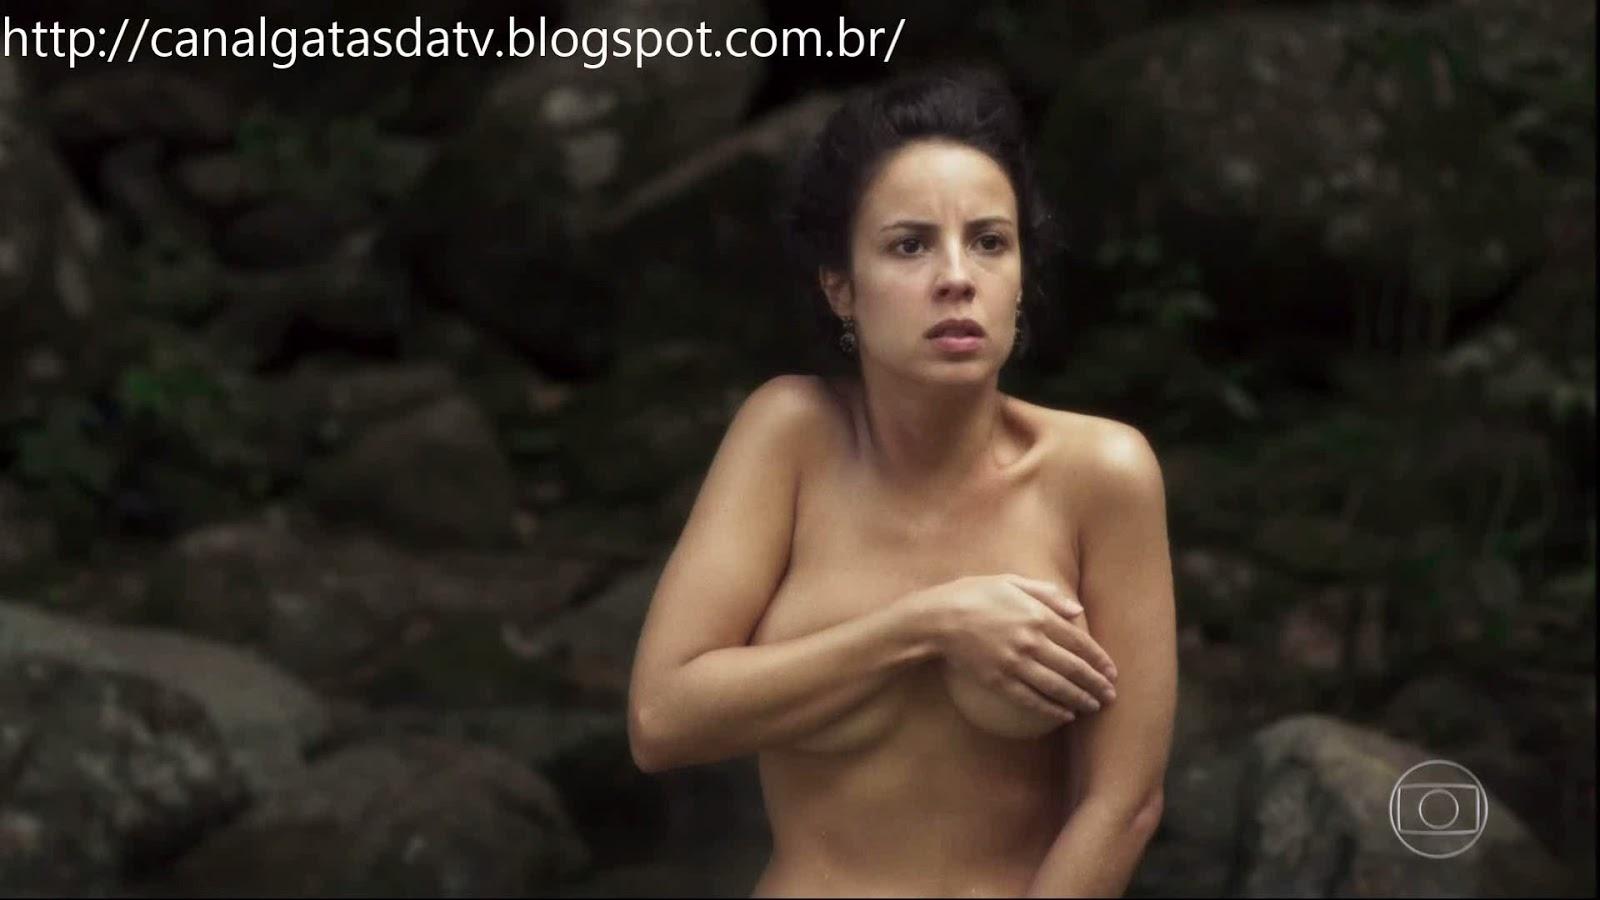 Andréa Horta Nua andreia horta - liberdade, liberdade #2